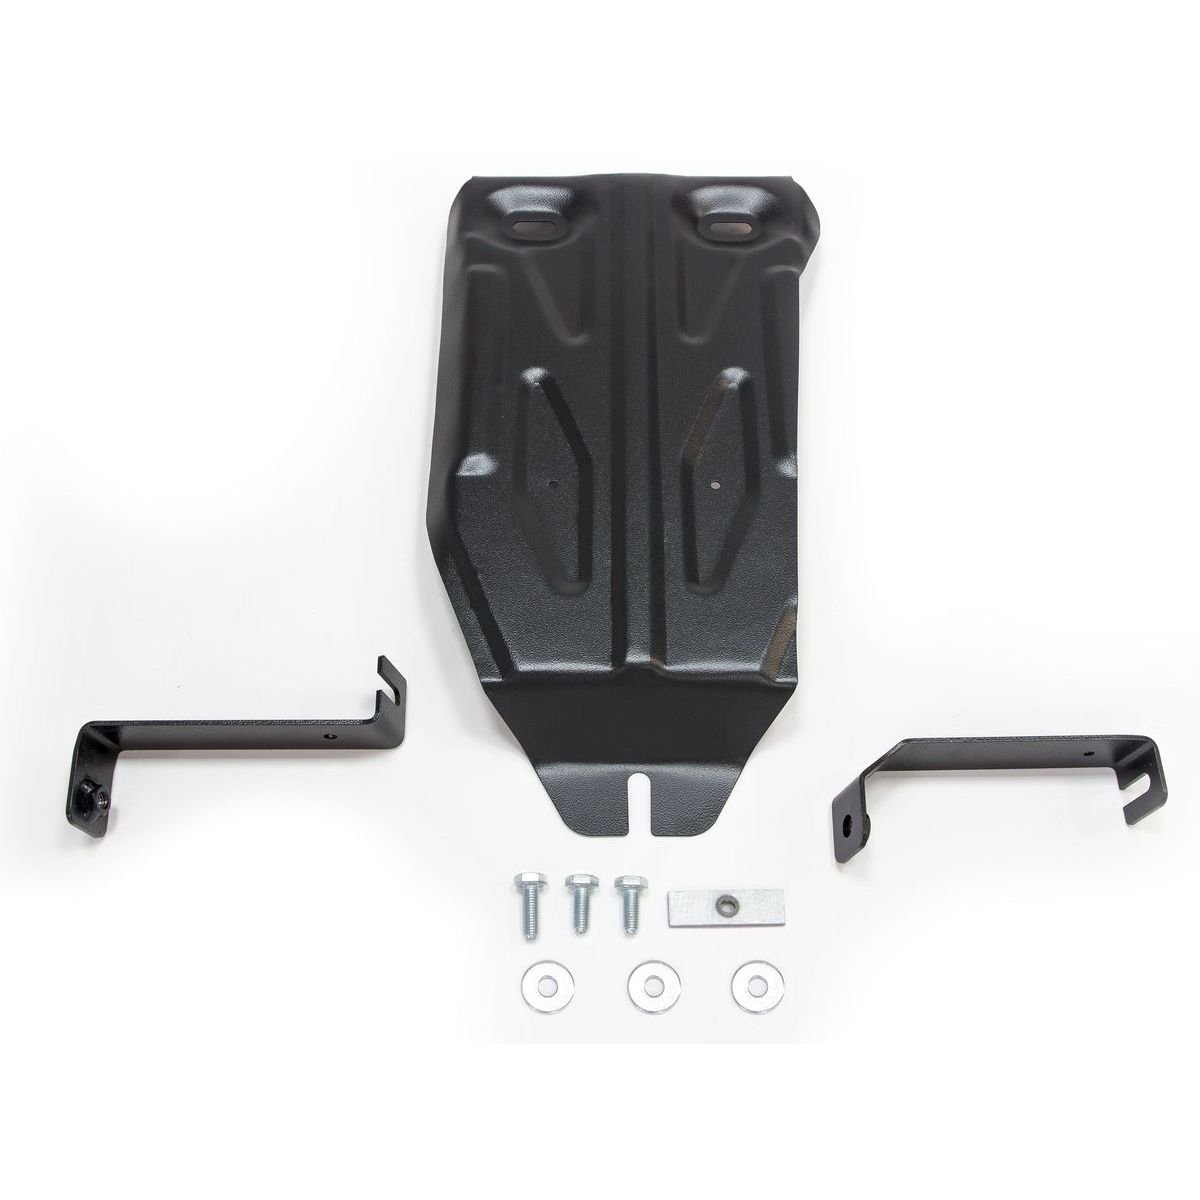 Защита редуктора Rival для Nissan Terrano III 4WD 2014-2016 2016-н.в./Renault Duster I 4WD 2011-2015 2015-н.в./Kaptur 4WD 2016-н.в., сталь 2 мм, с крепежом. 111.4719.1 защита редуктора rival для nissan terrano 4wd 2014 н в renault duster 4wd 2011 н в kaptur 4wd 2016 н в алюминий 4мм 333 4719 1